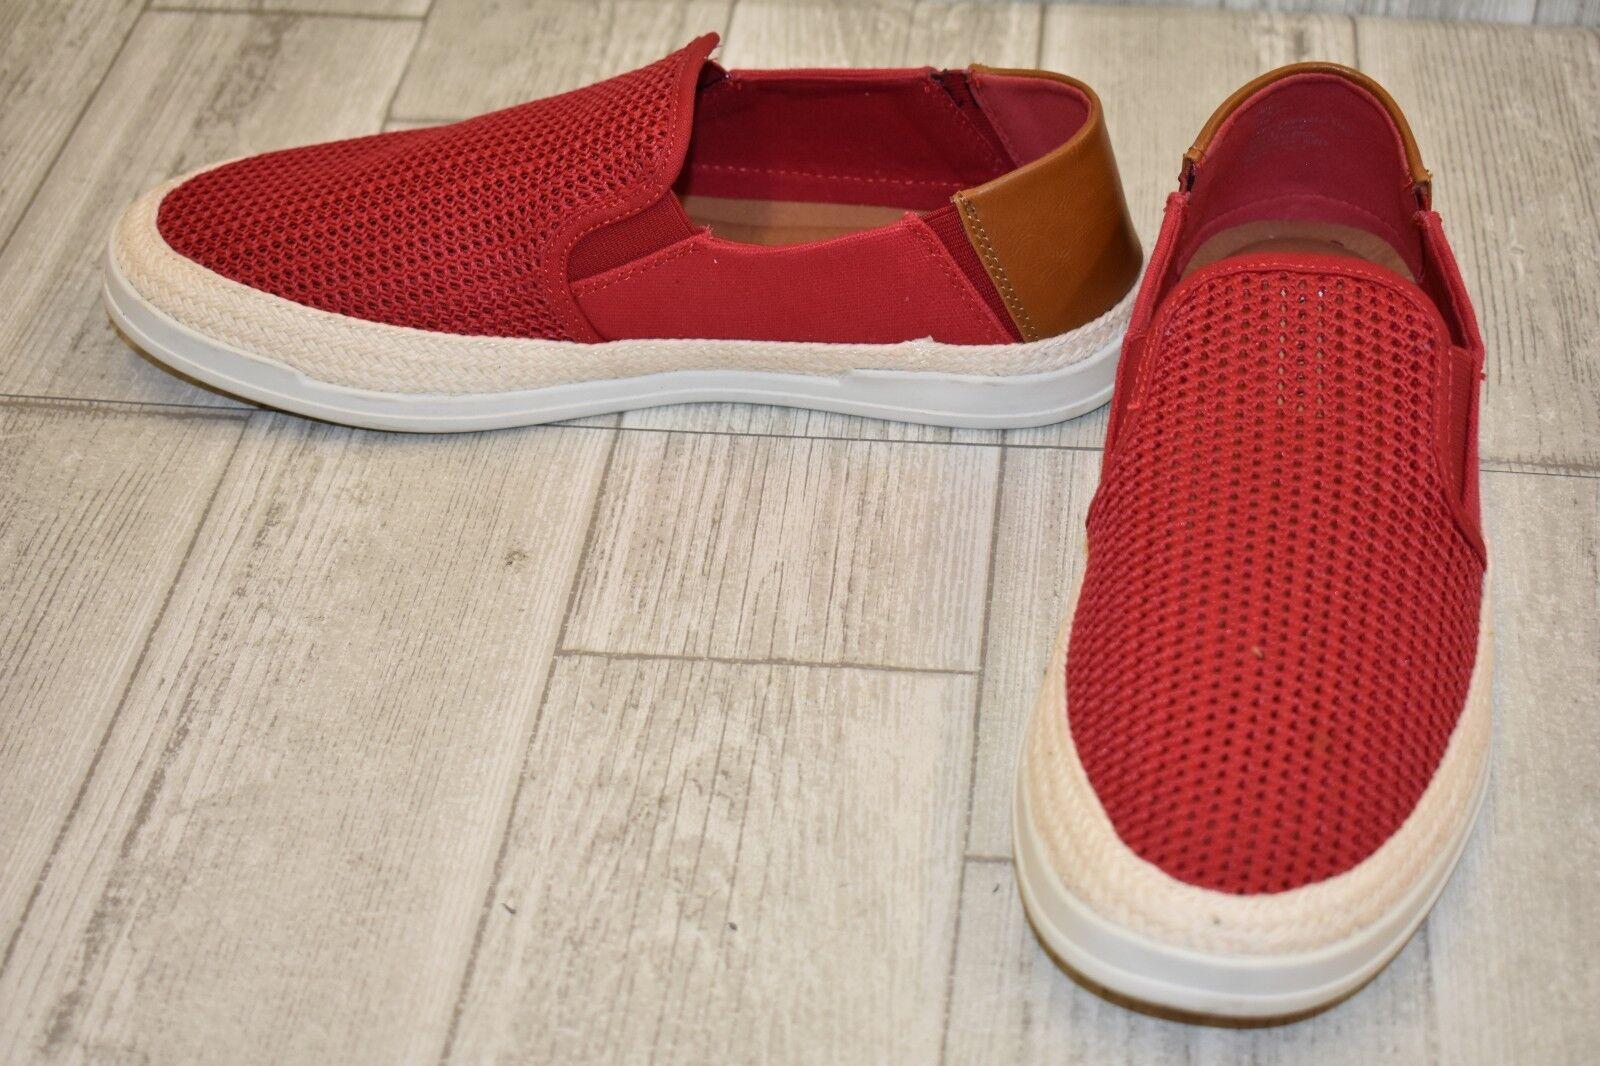 Steve Madden Surfari Surfari Surfari Mesh Slip-On Sneakers, Men's Size 10M, Red cd1f31